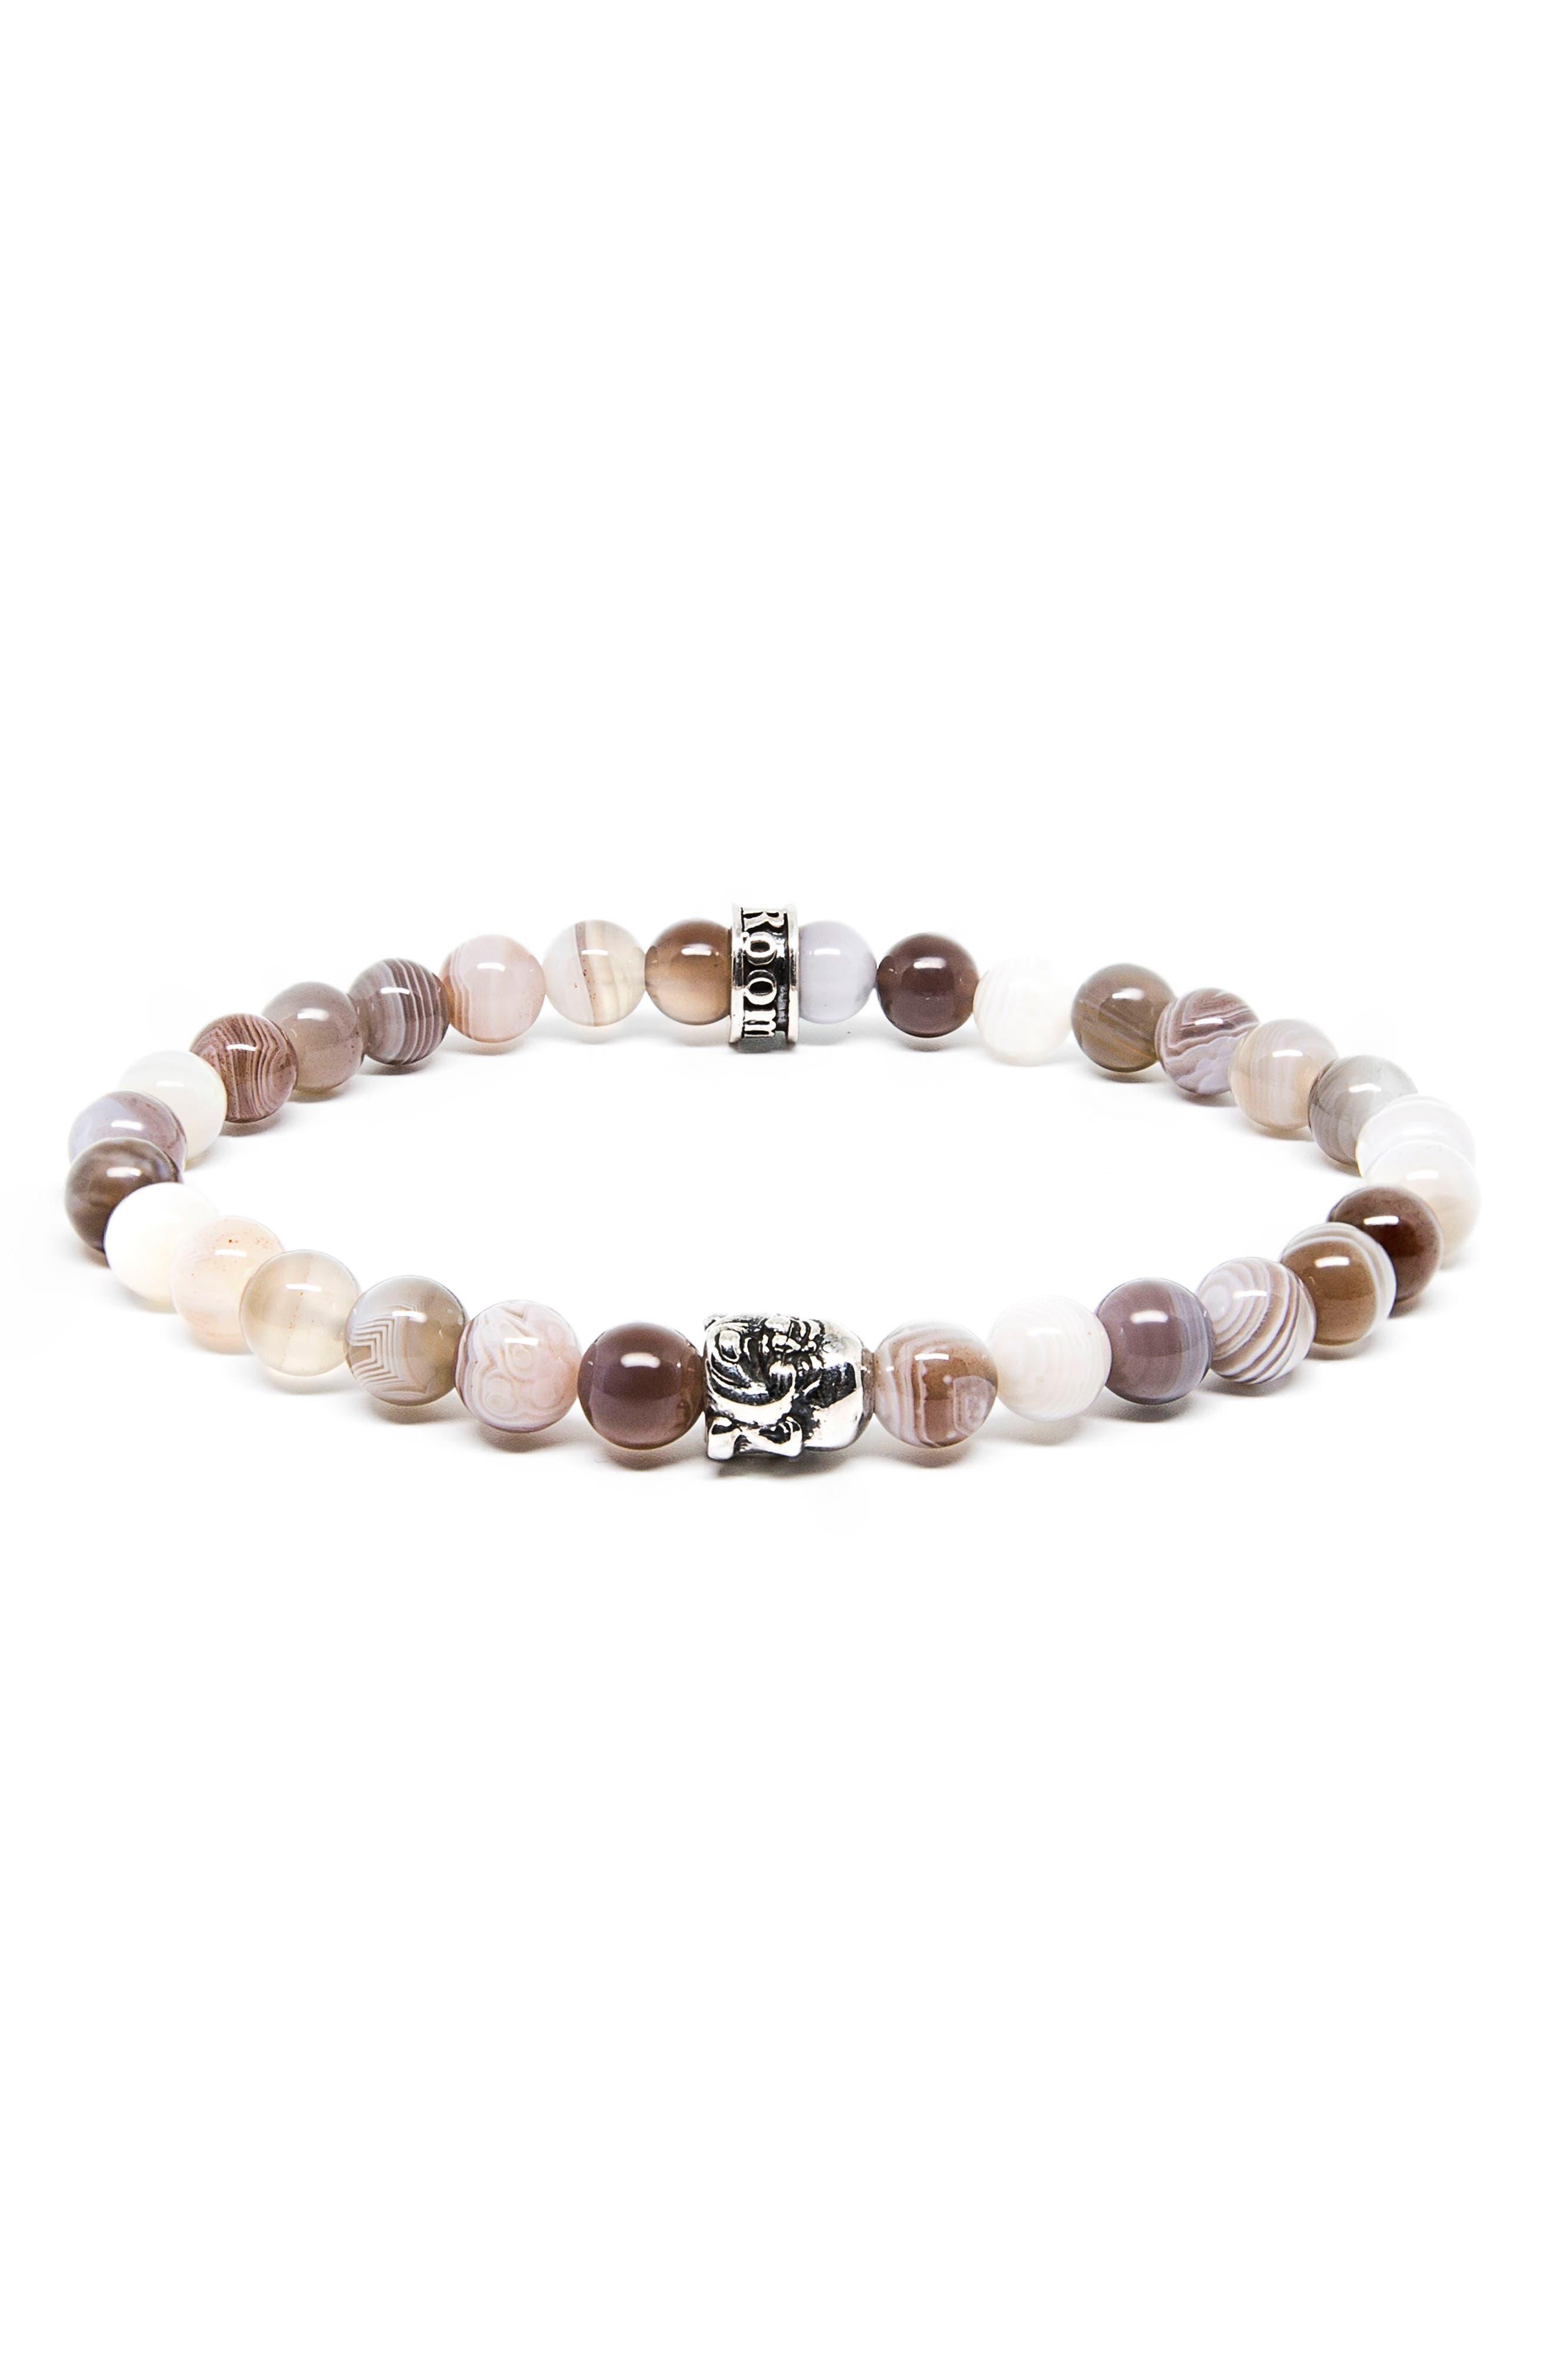 Agate Buddha Stretch Bracelet,                         Main,                         color, 060